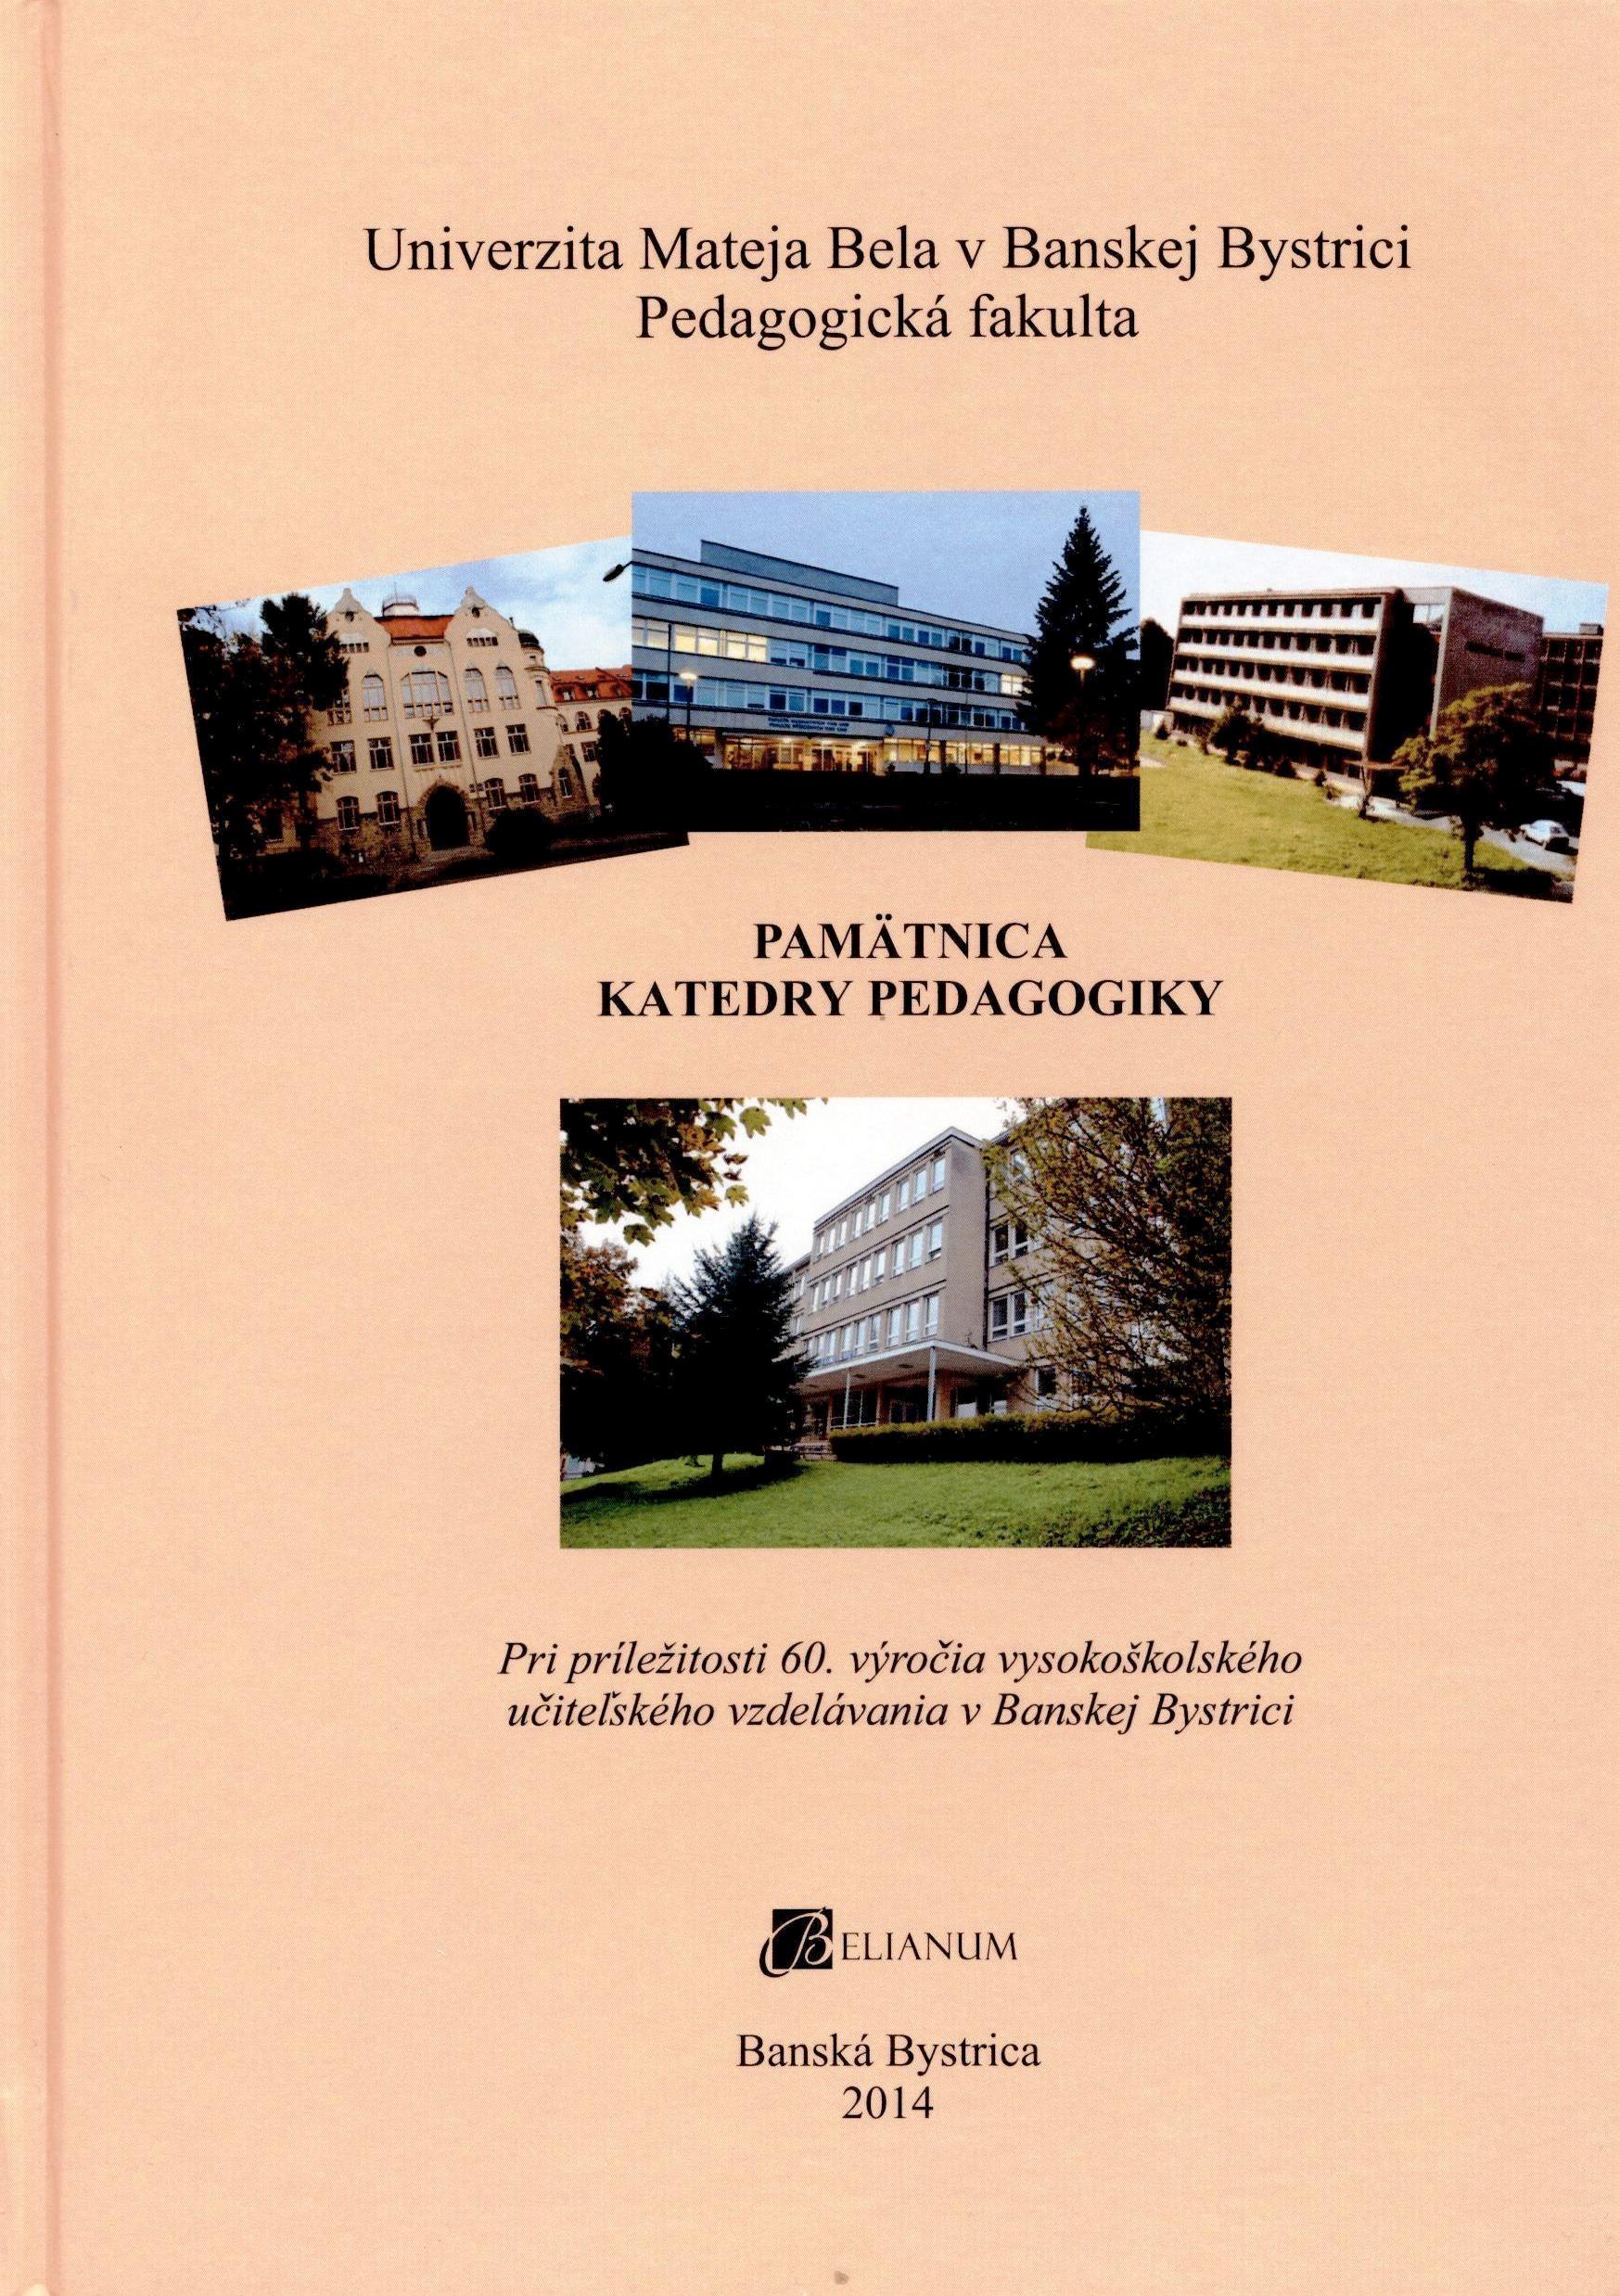 Pamätnica Katedry pedagogiky